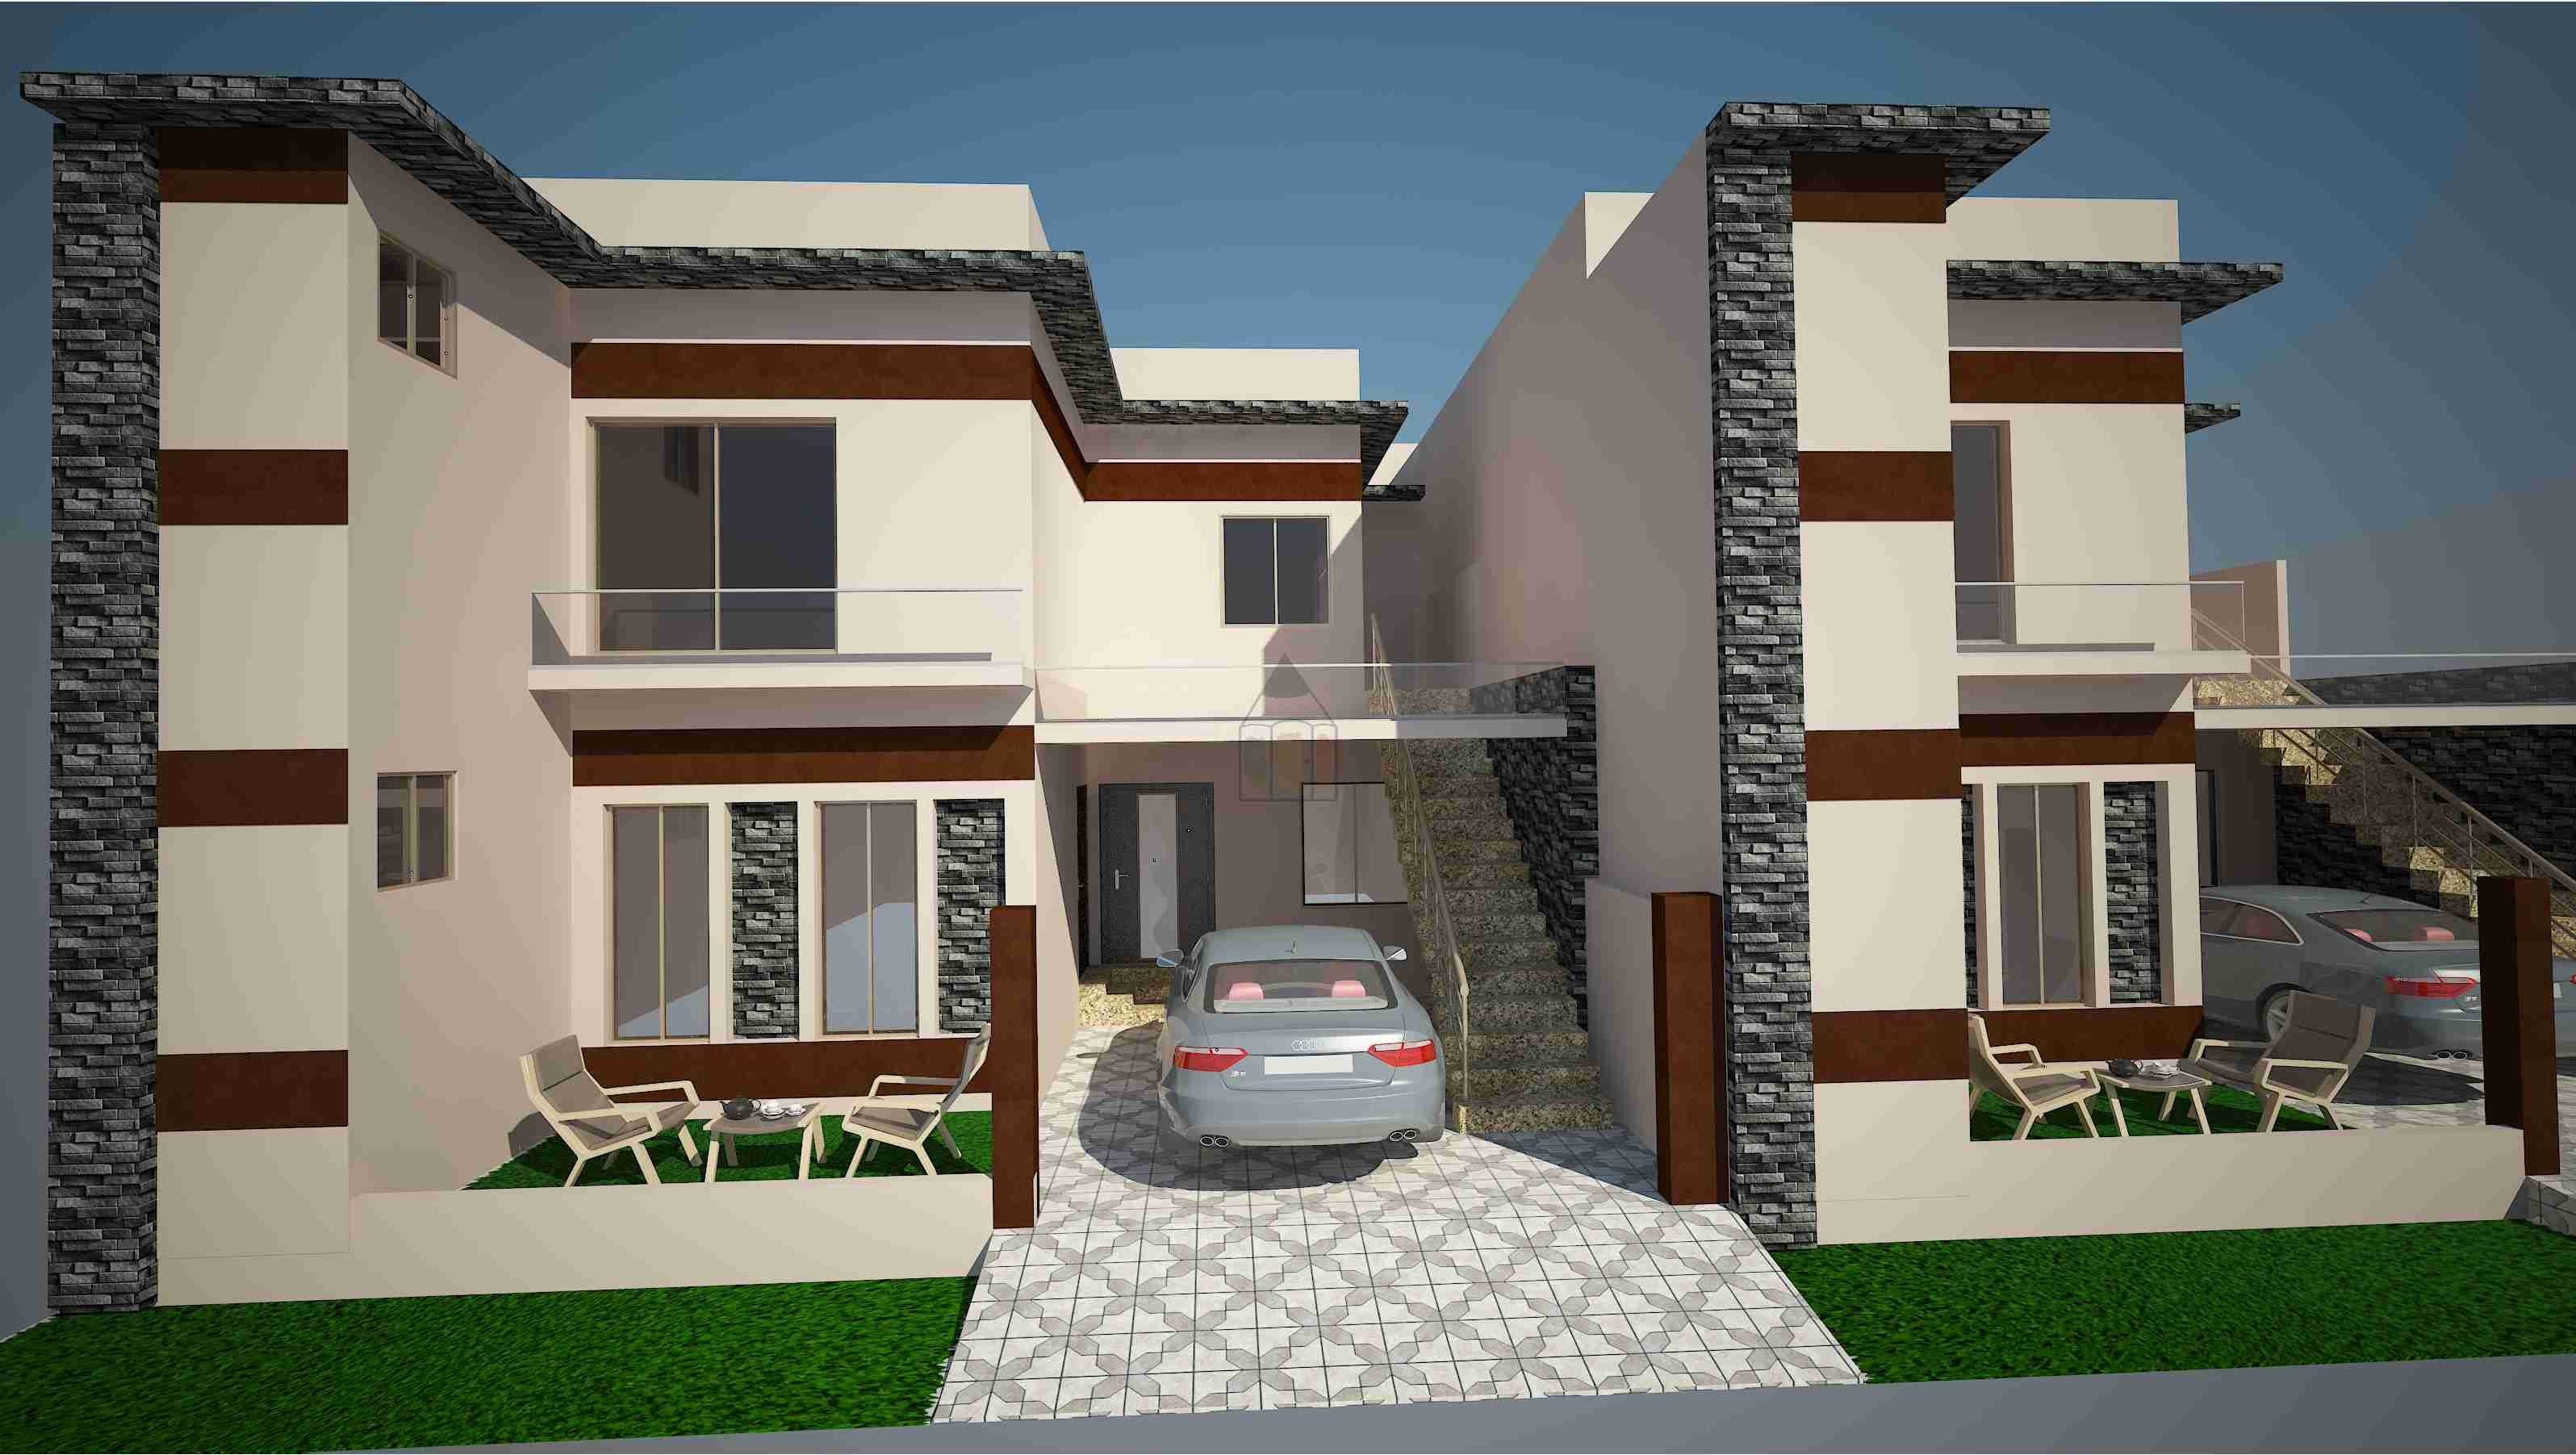 Superior Front Design Of 7 Marla House Part - 3: 7 Marla House Design Model Front Elevation